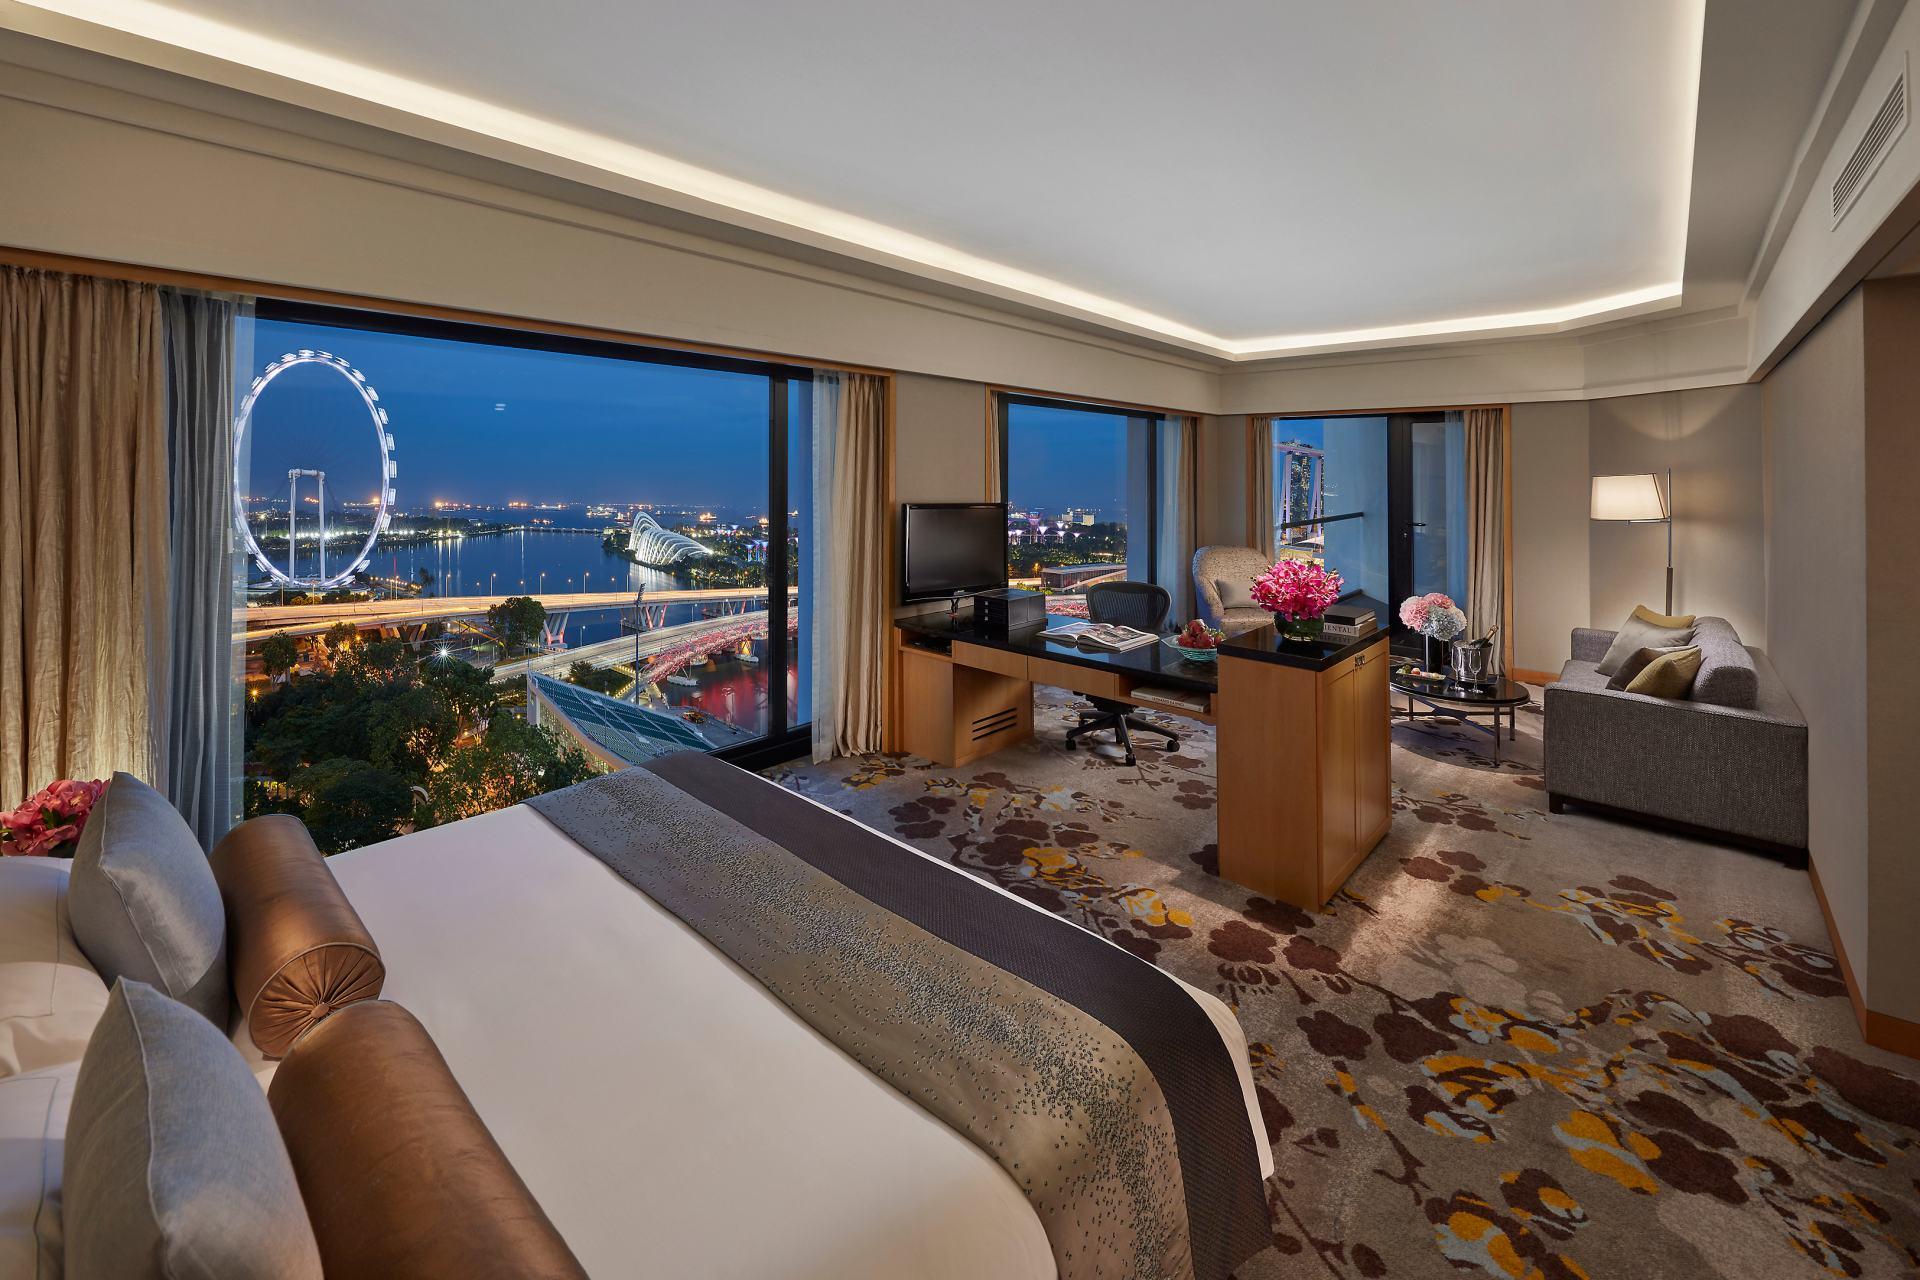 singapore-2017-room-ocean-grand.jpg